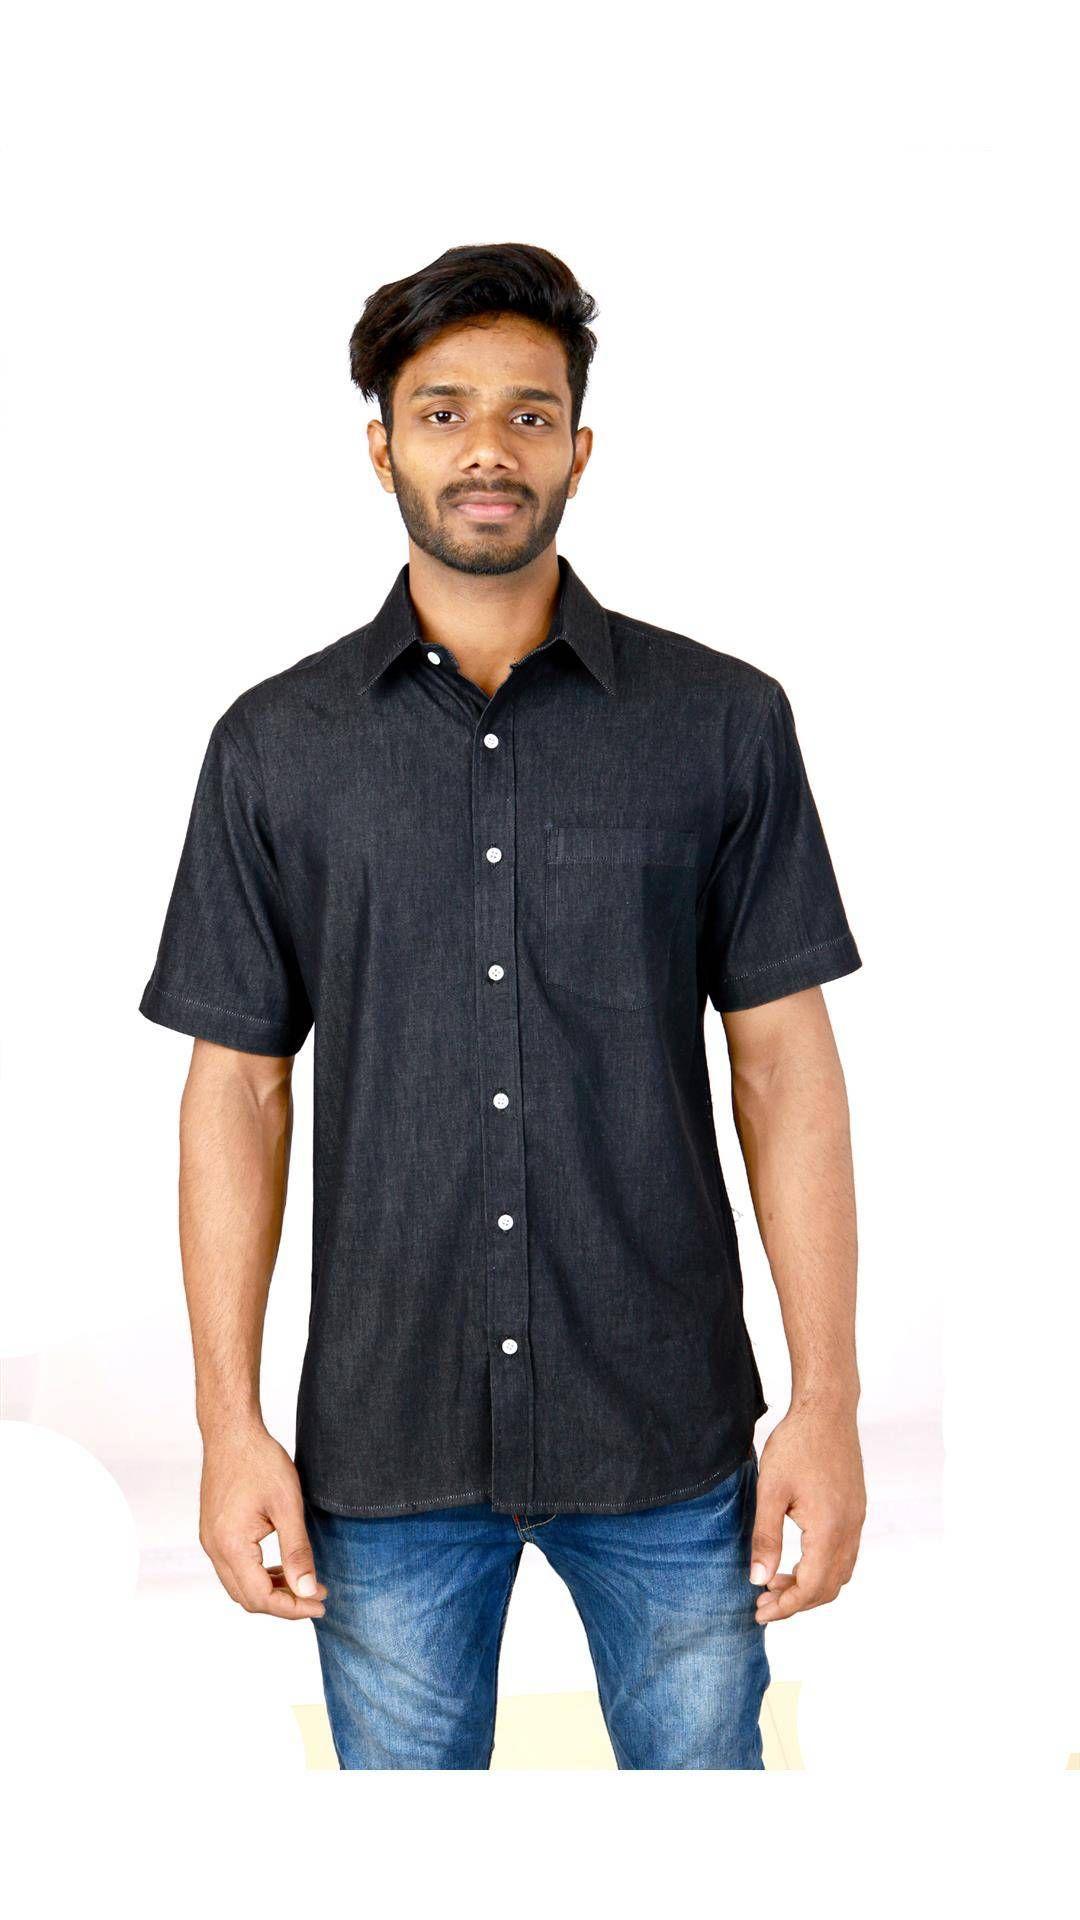 c5bdca2ef0b Buy COBRIO Black Denim Short Sleeve Shirt Online at Low Prices in India -  Paytm.com